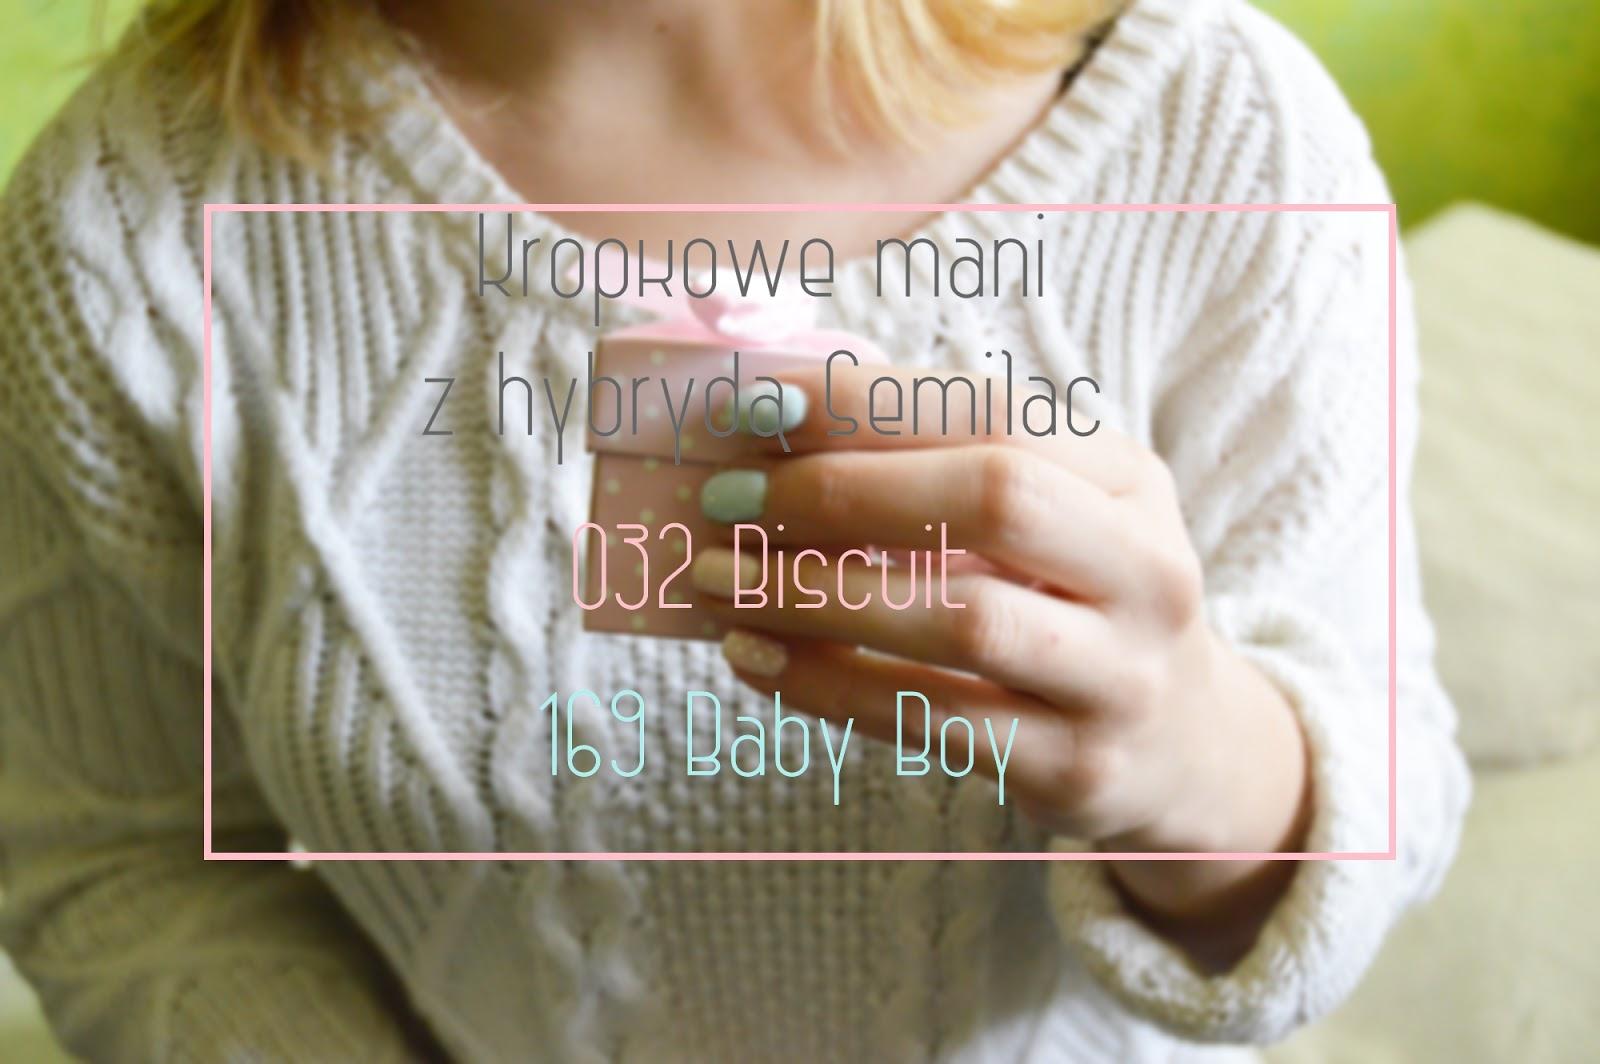 DELIKATNE KROPKOWE MANI Z HYBRYDAMI SEMILAC: 169 BABY BOY, 032 BISCUIT I 001 STRONG WHITE